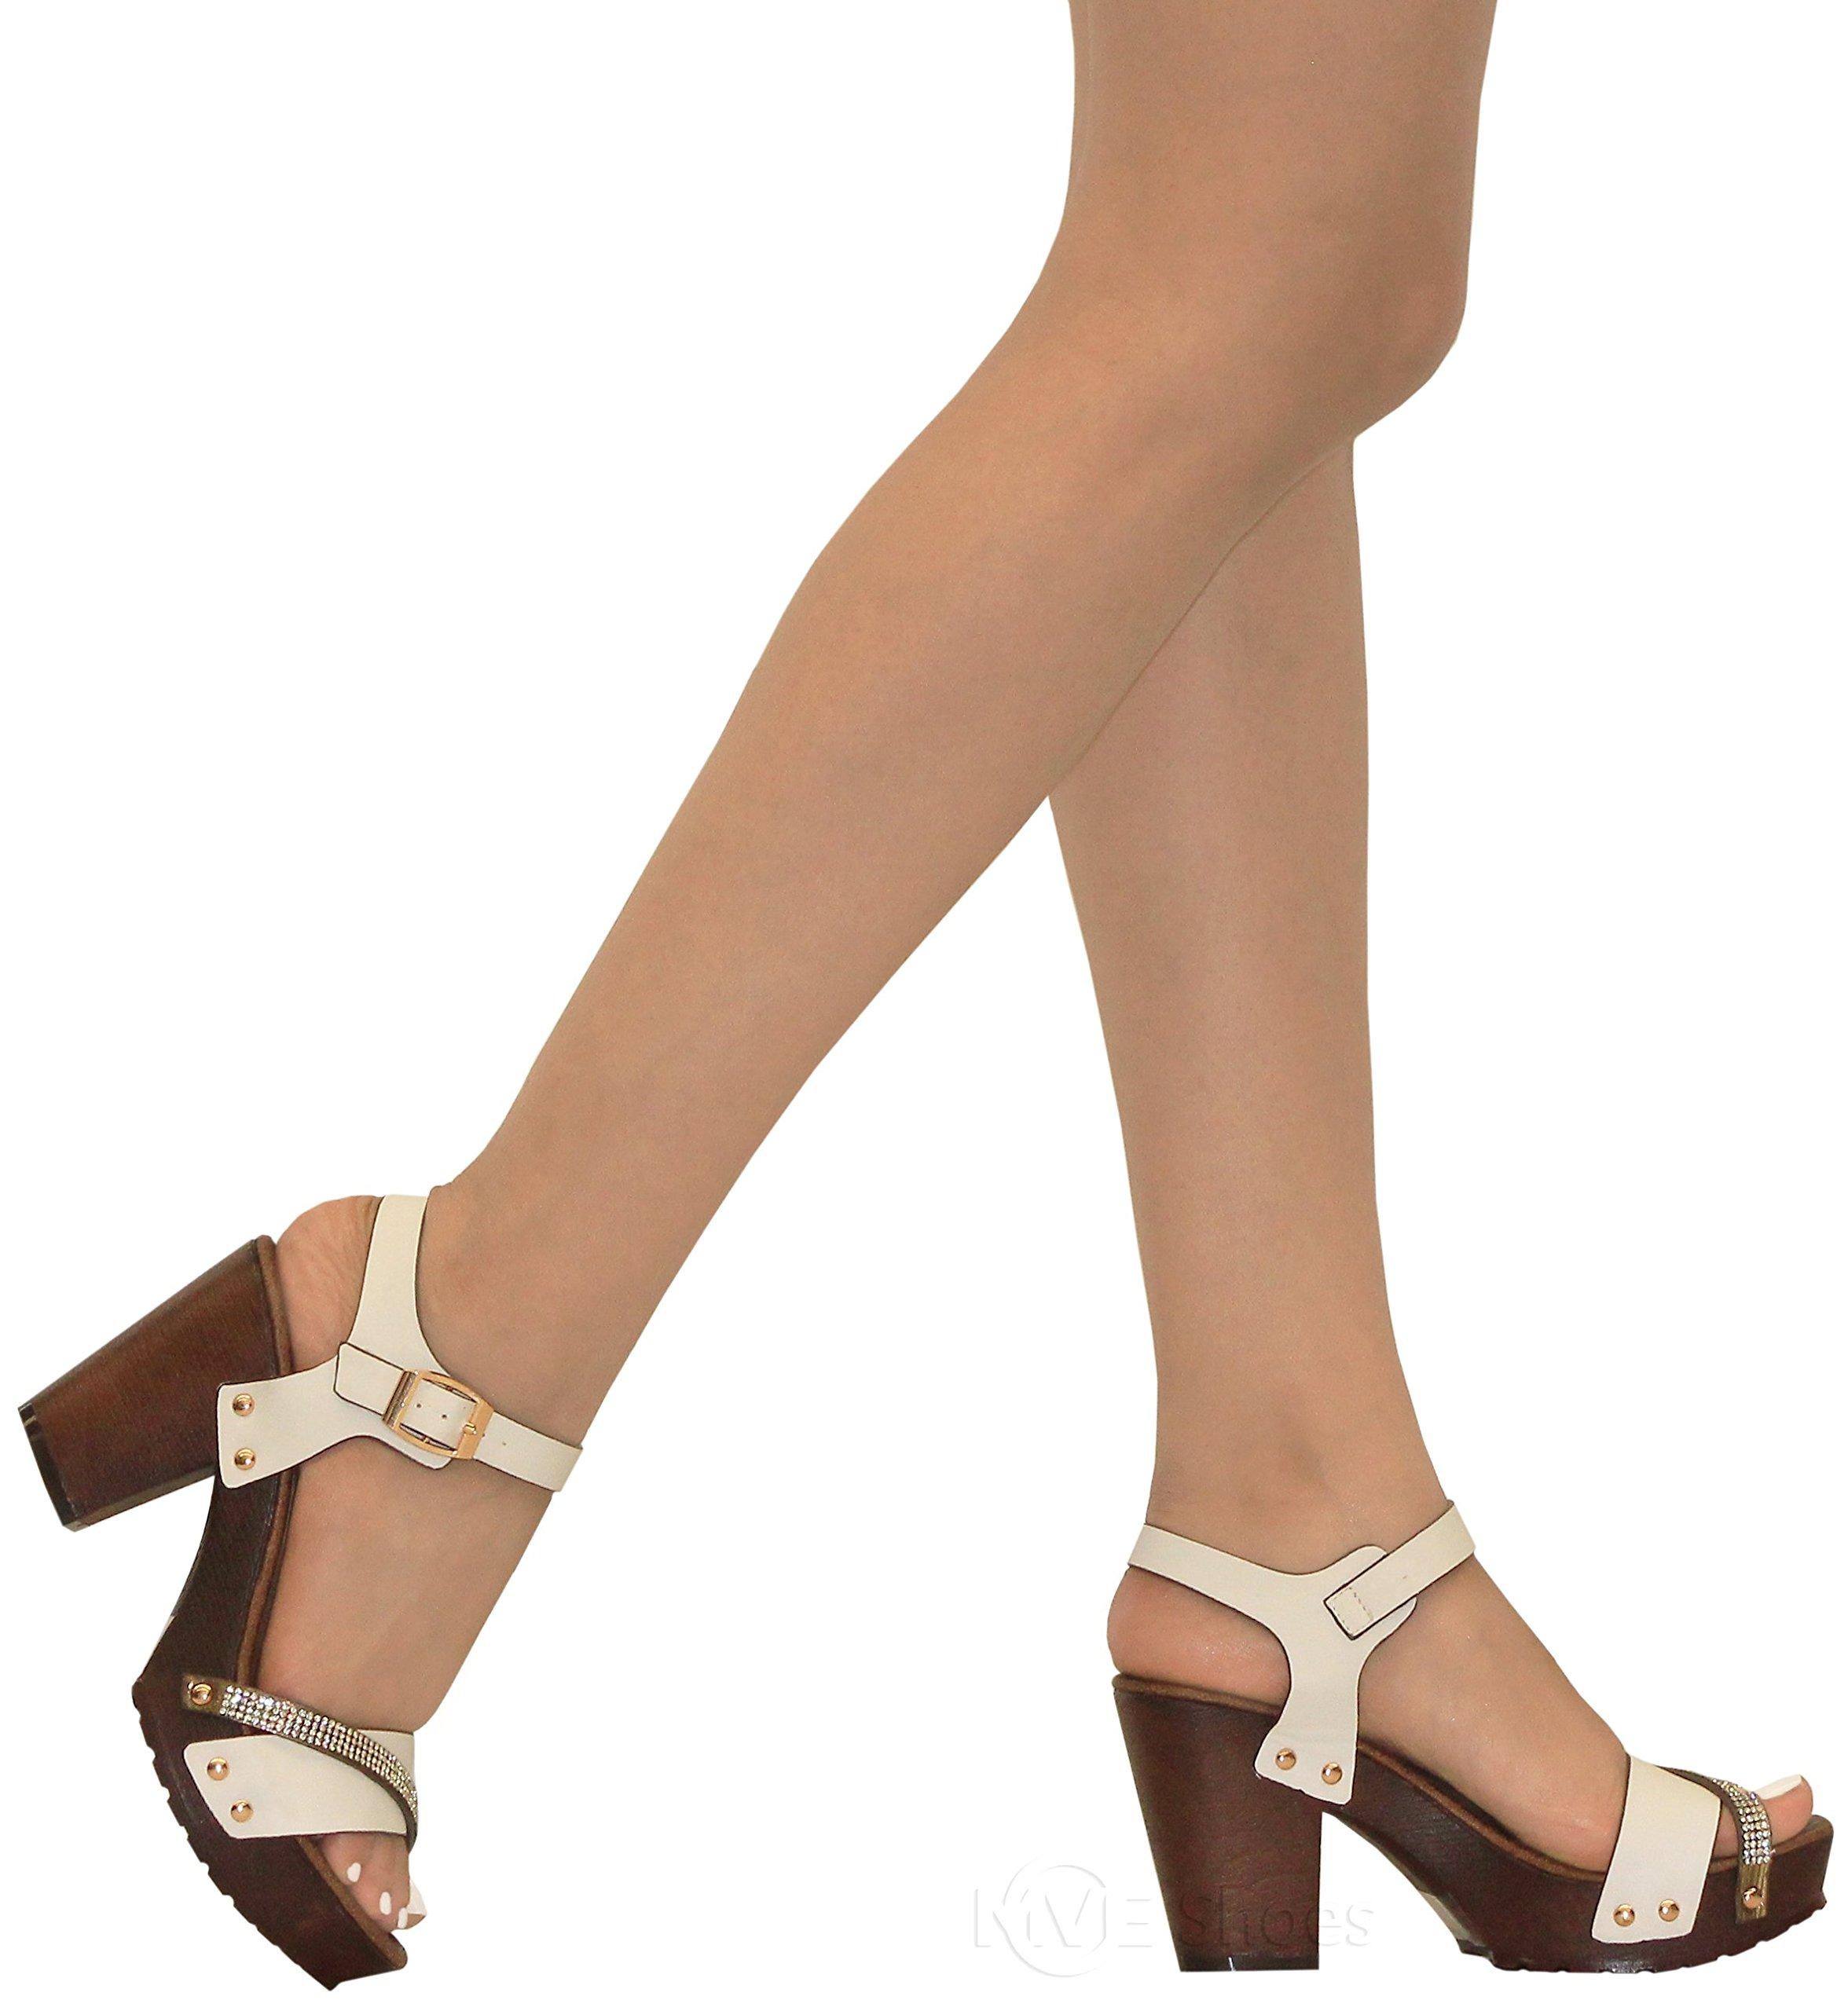 MVE Shoes Women's Ankle Strap Faux Wood Platform Chunky Heel Sandal,vint-02 White pu 10 by MVE Shoes (Image #5)